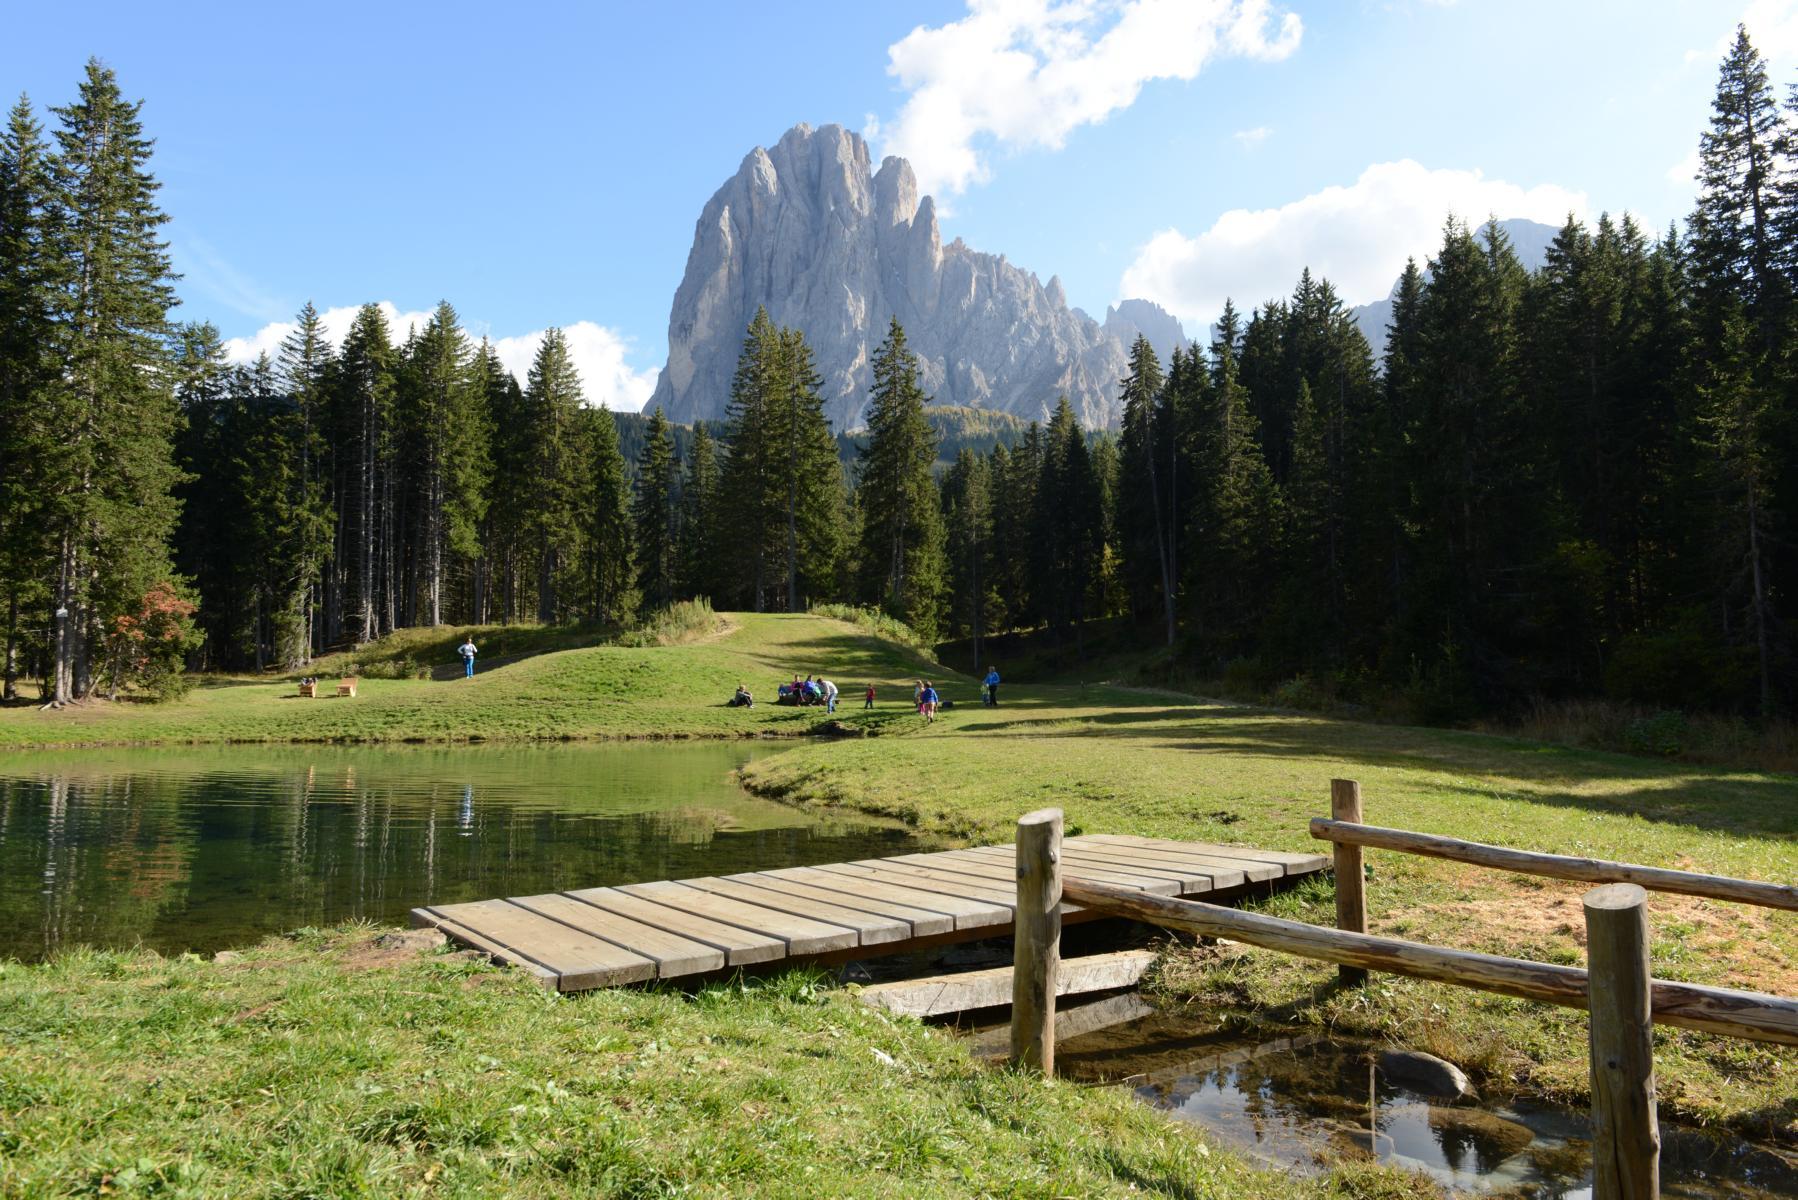 Monte Pana, Val Gardena, Italy